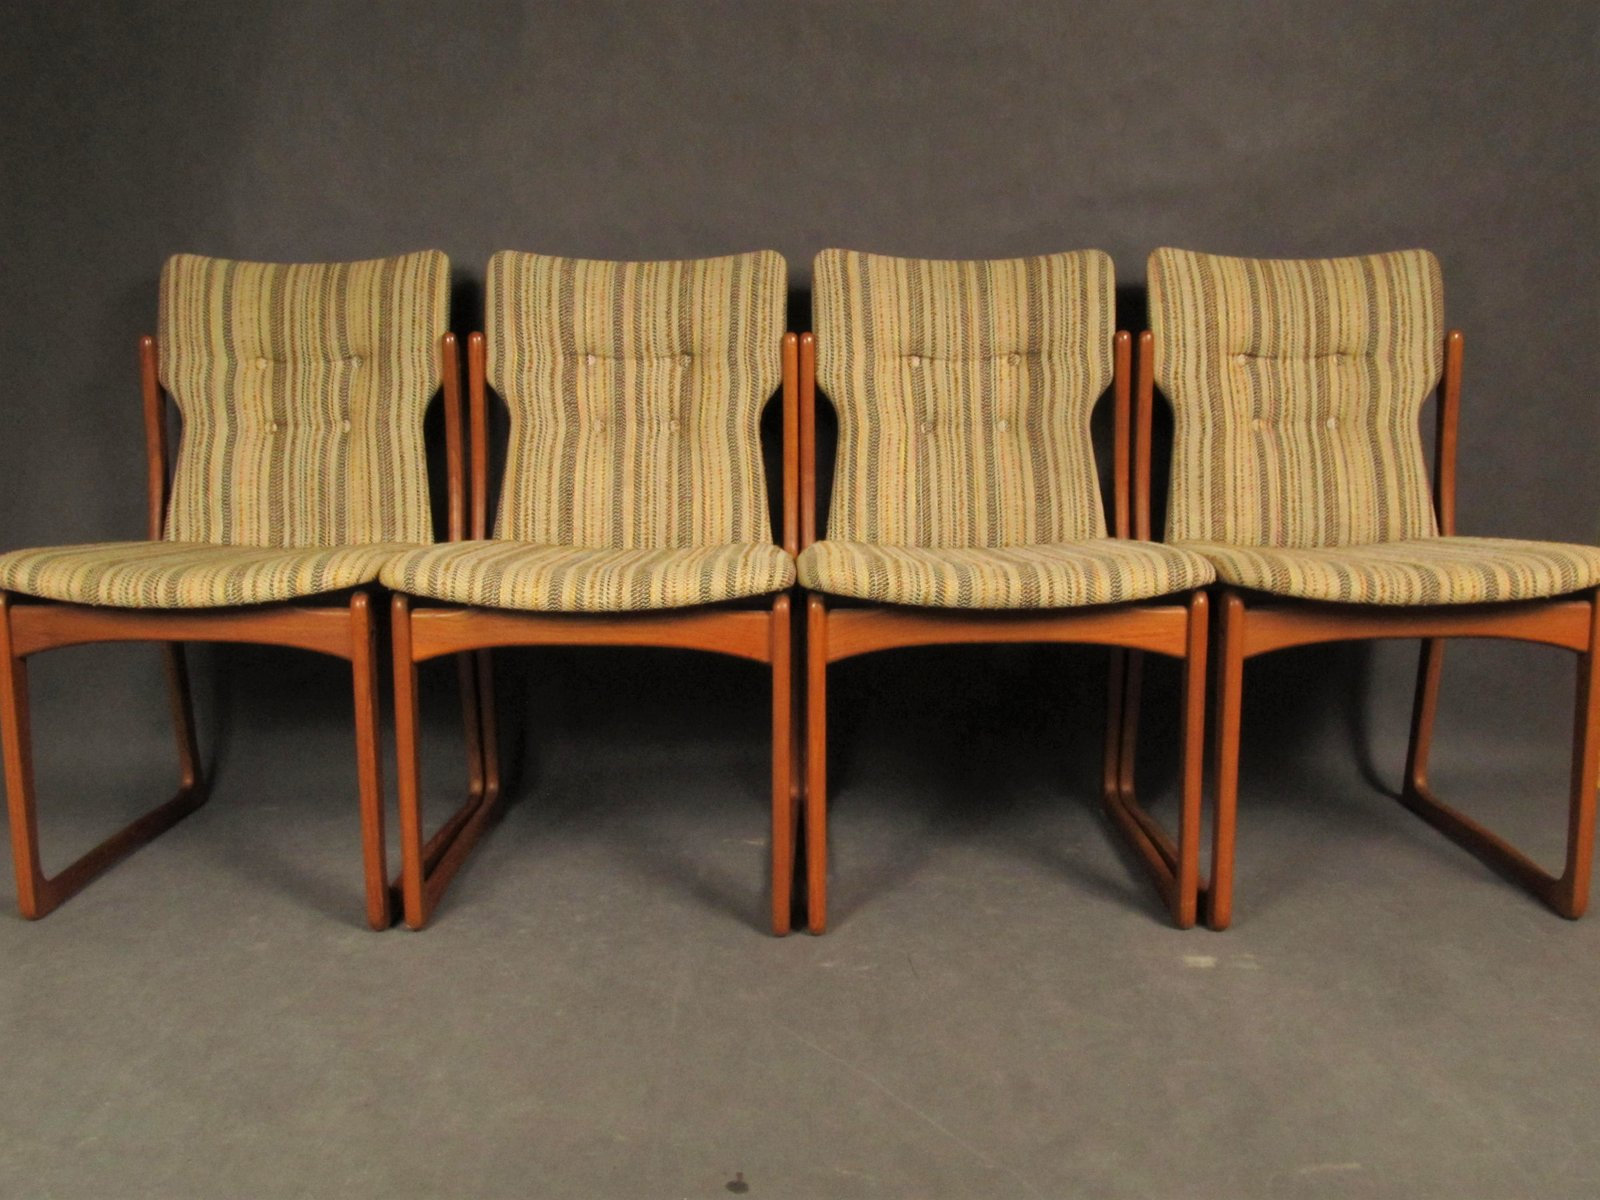 Mid Century Dining Room Chairs From Vamdrup Stolefabrik 1960s Set Of 4